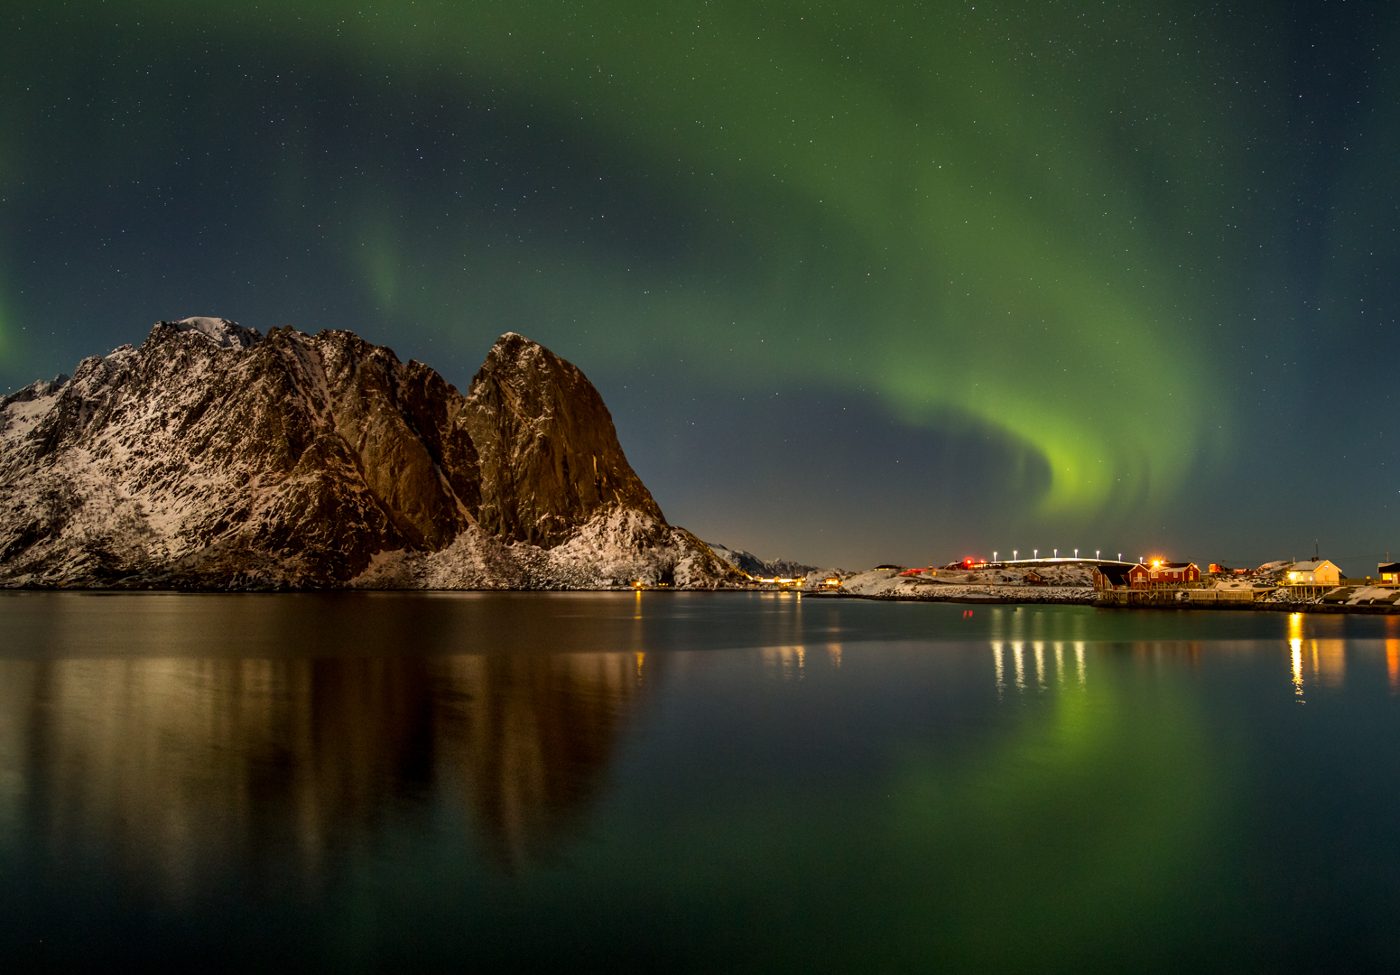 Illuminated Bridge | © Irmgard Crispin